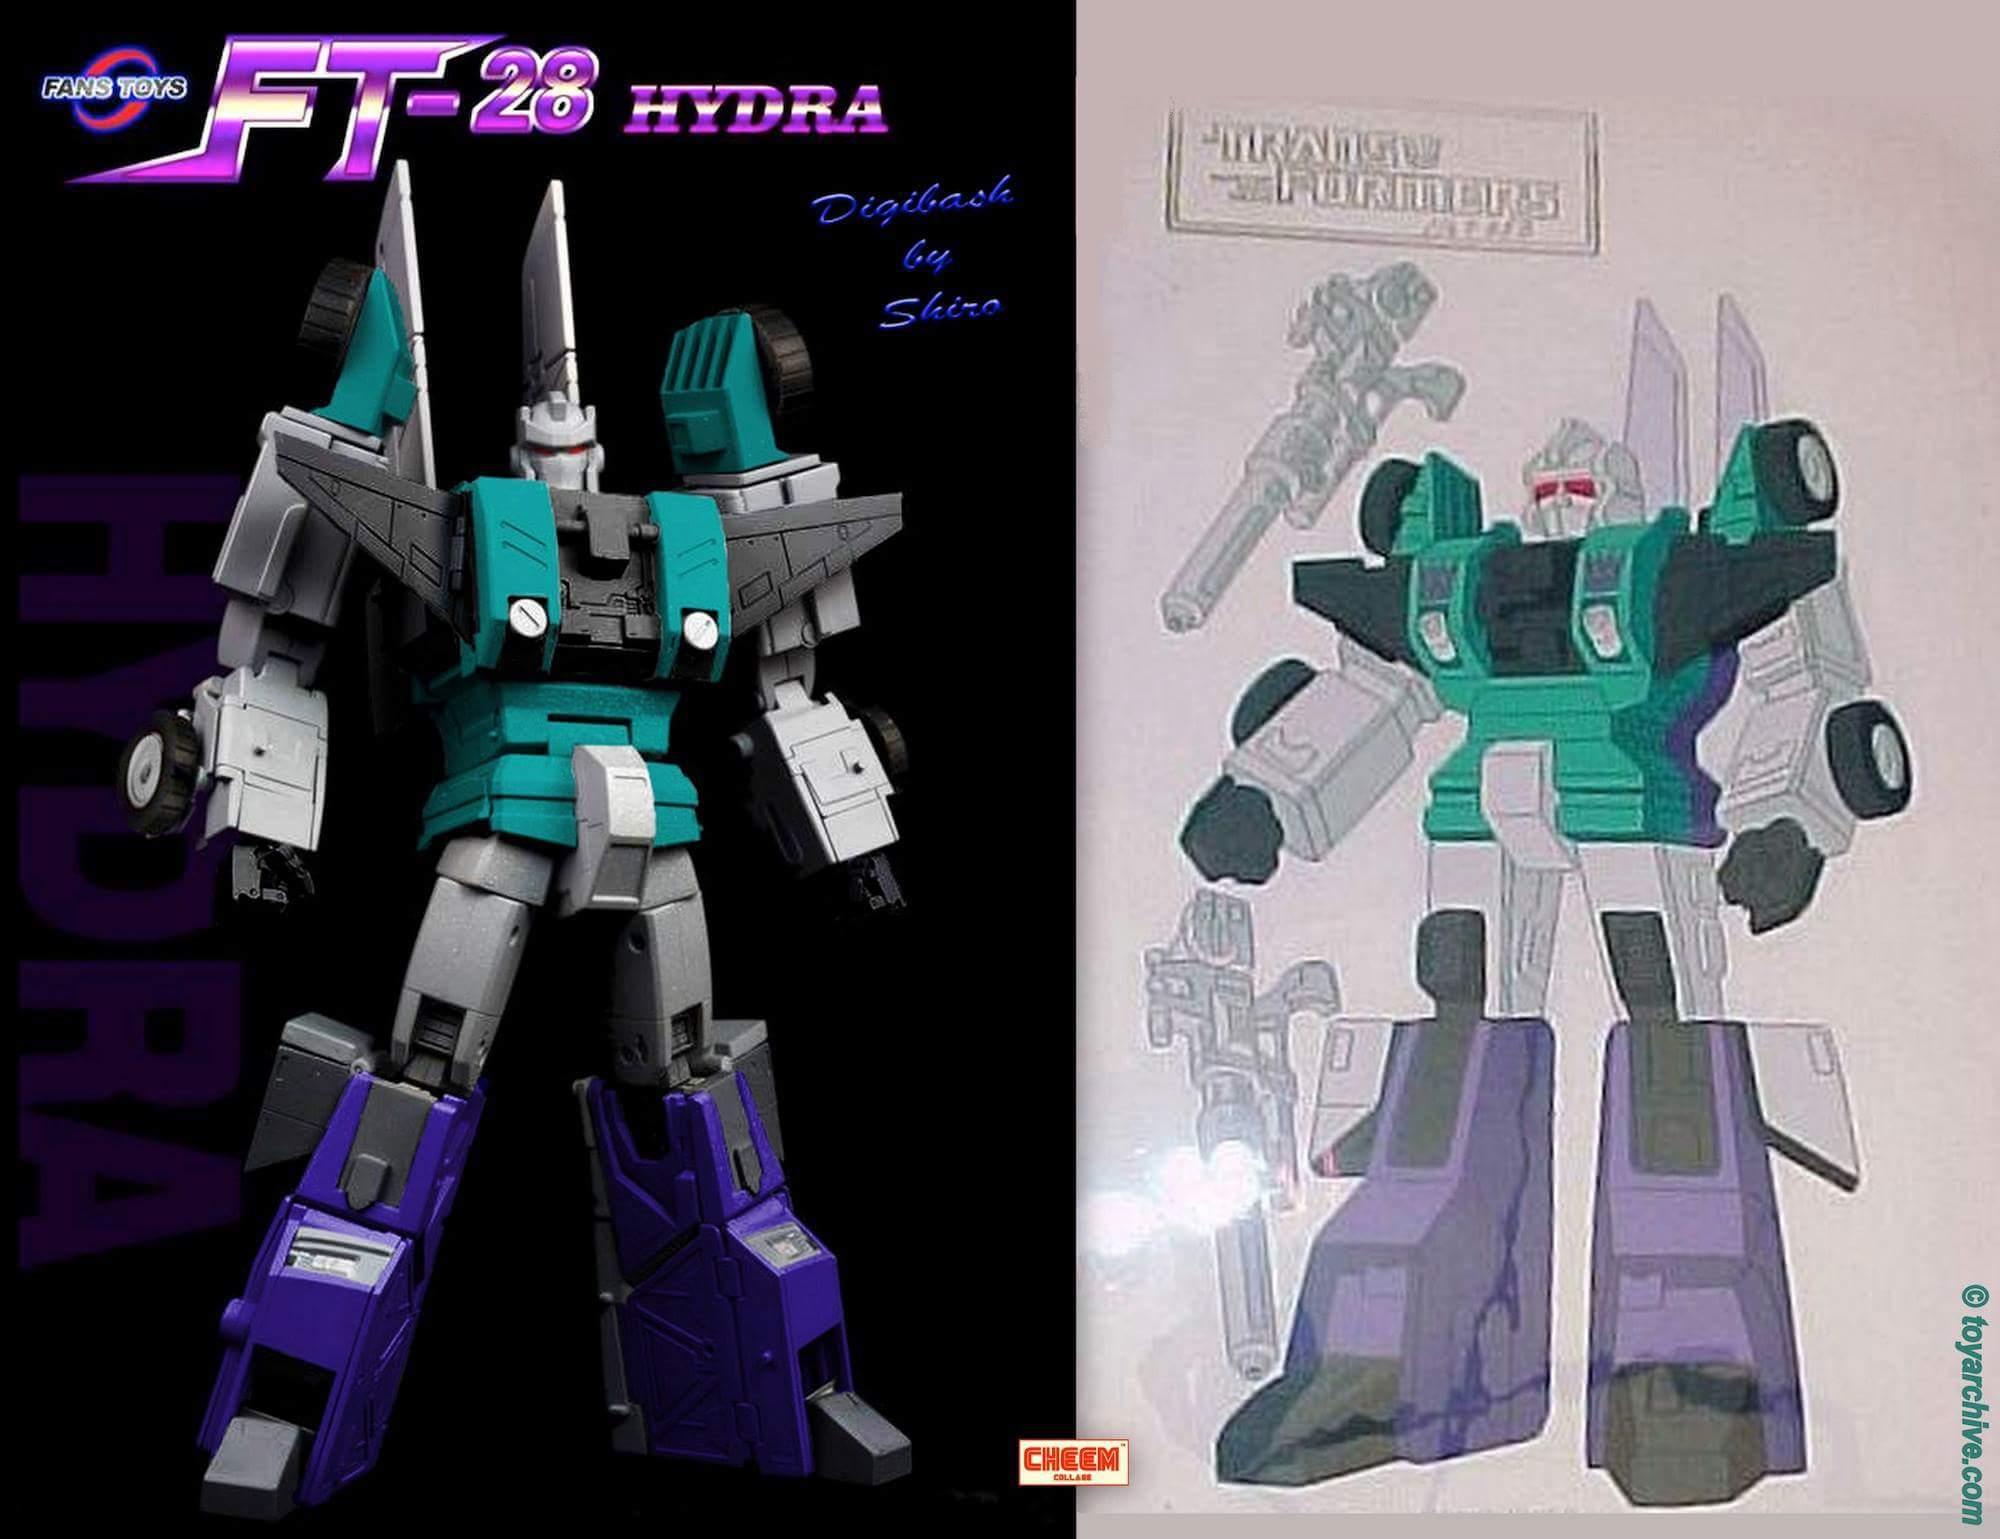 [Fanstoys] Produit Tiers - Jouet FT-28 Hydra aka Sixshot/Hexabot 7VD3HgSw